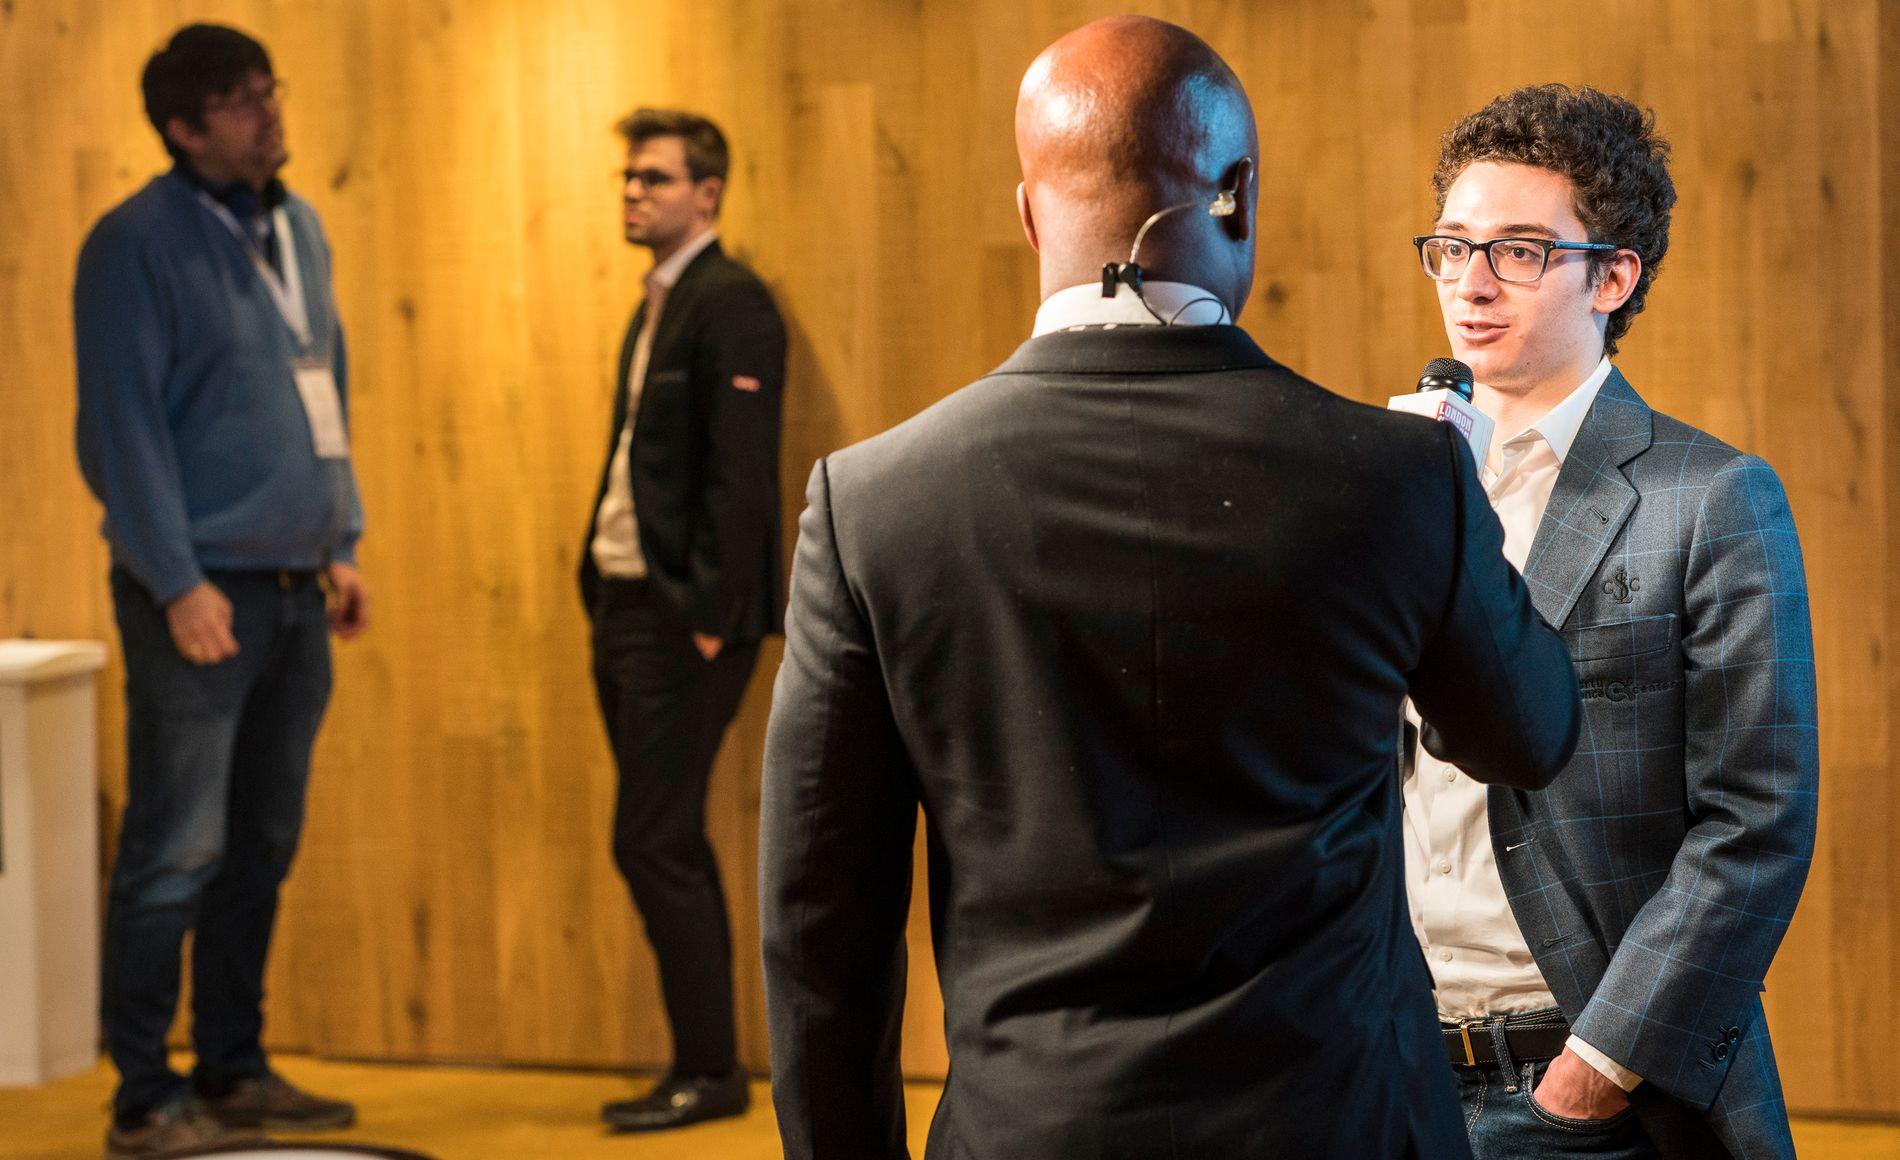 RIVALER: Fabiano Caruana (t.h.) intervjuet i forbindelse med møtet med Magnus Carlsen (bak) i St. Louis i høst. Til venstre Carlsens trener Peter Heine Nielsen. Med ryggen til Maurice Ashley.